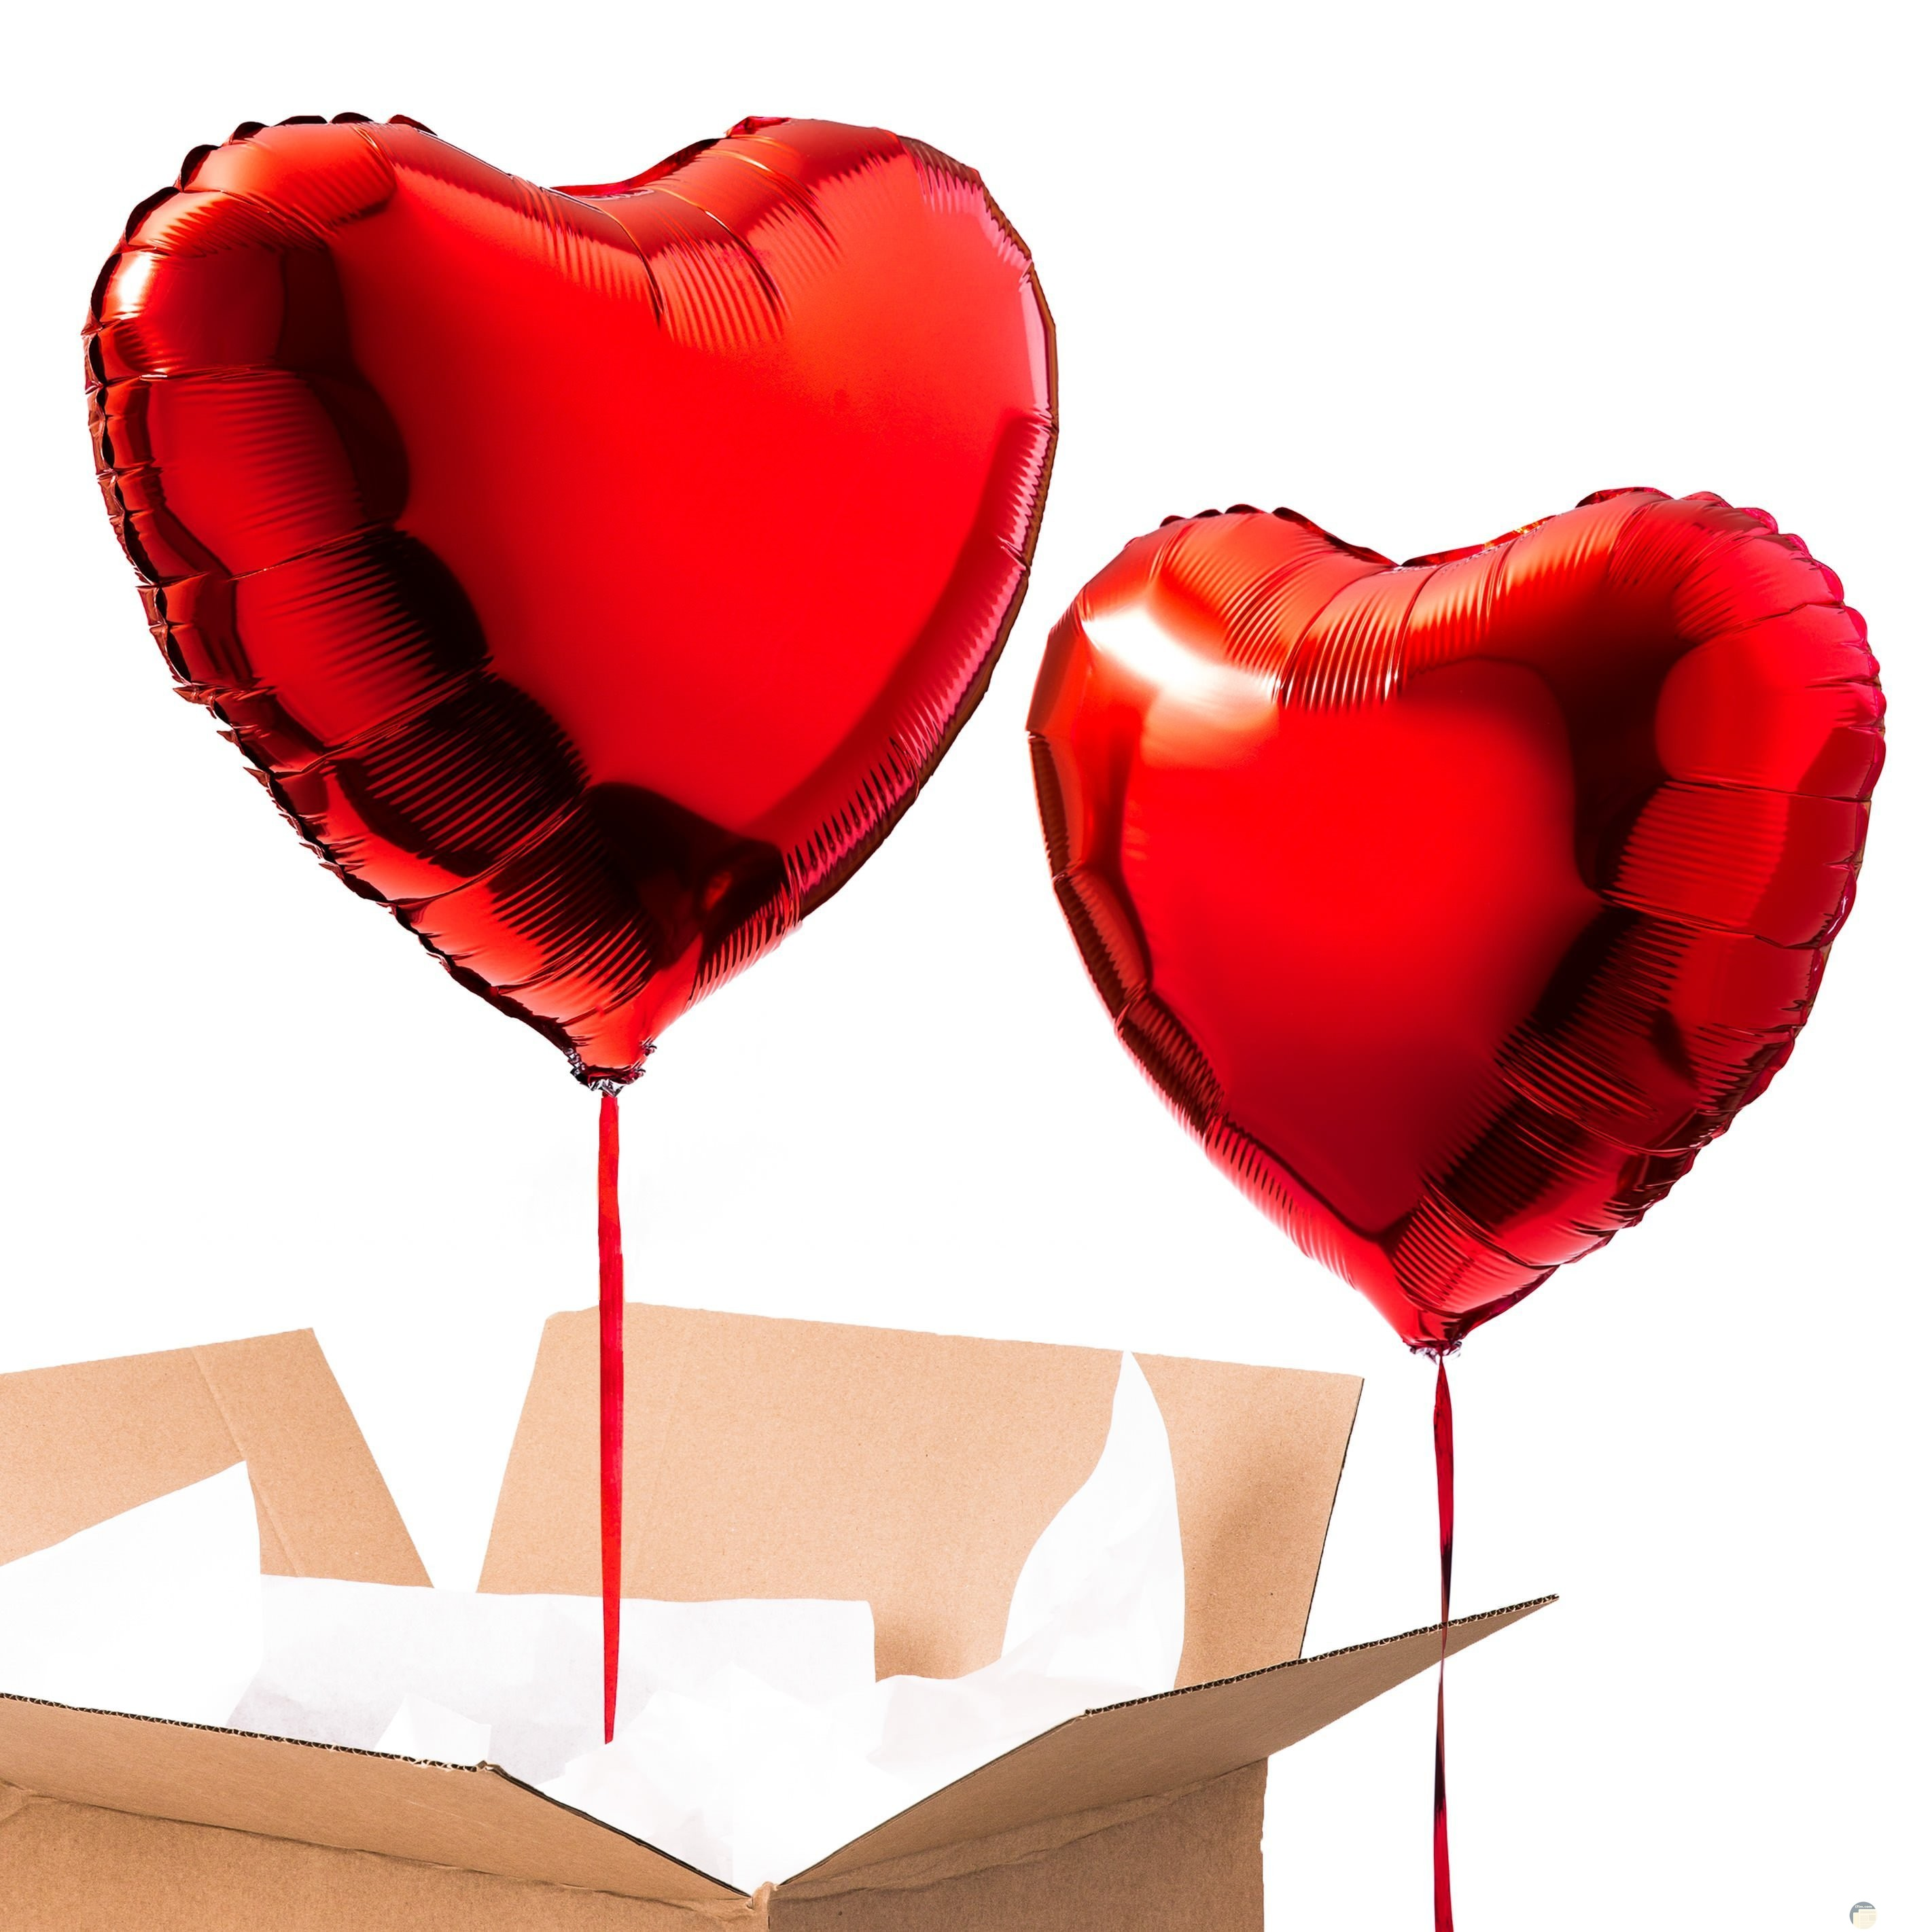 صور قلب أحمر